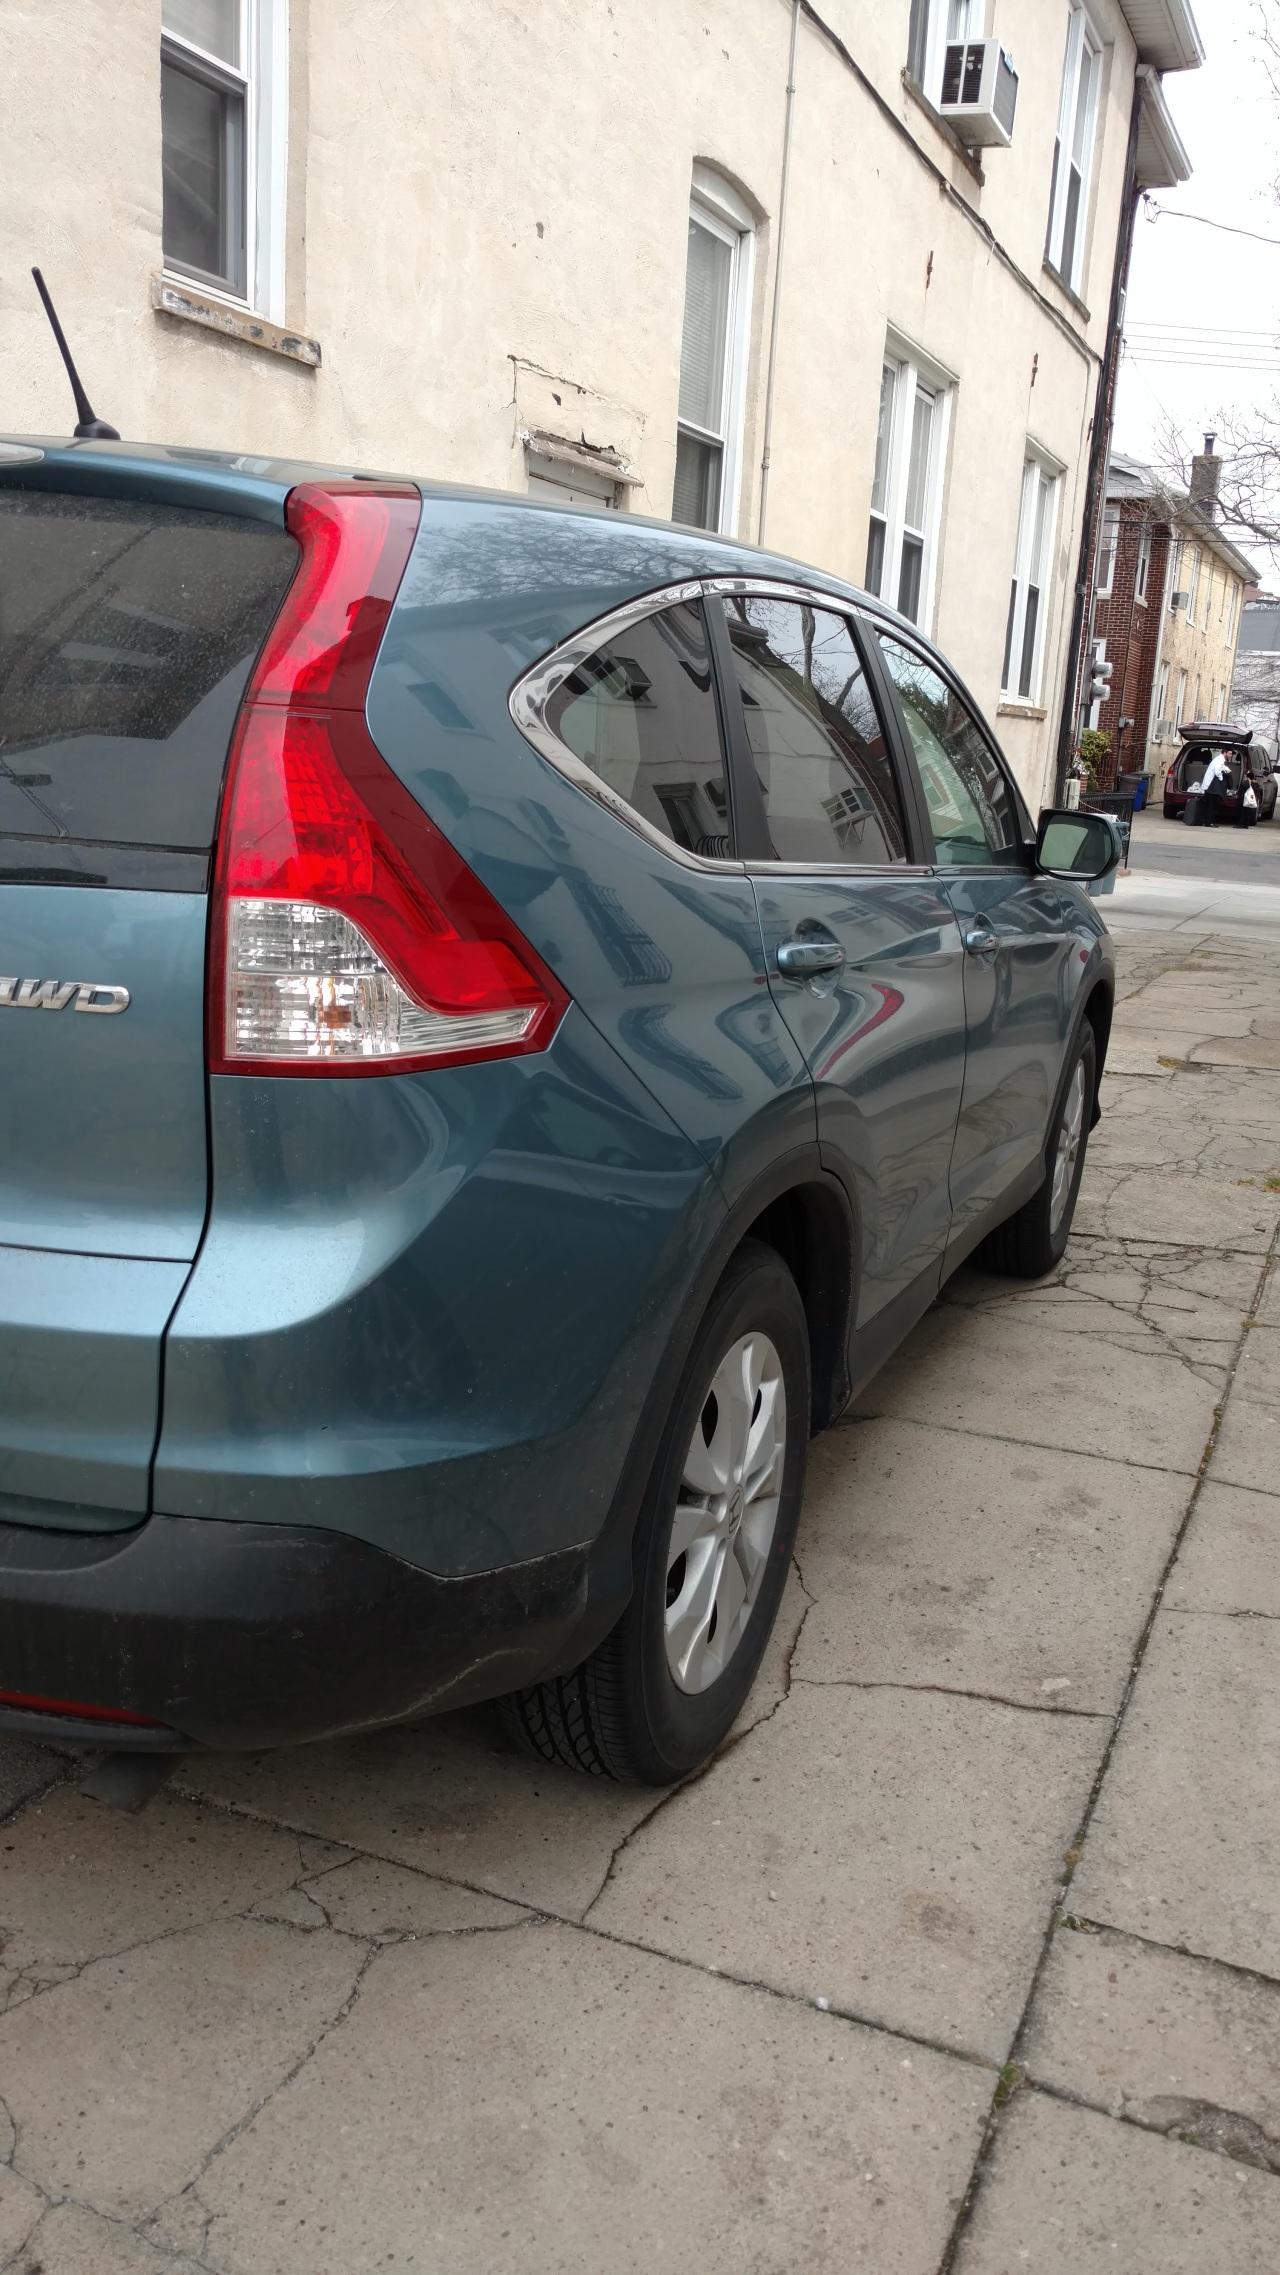 Honda CRV April 2016